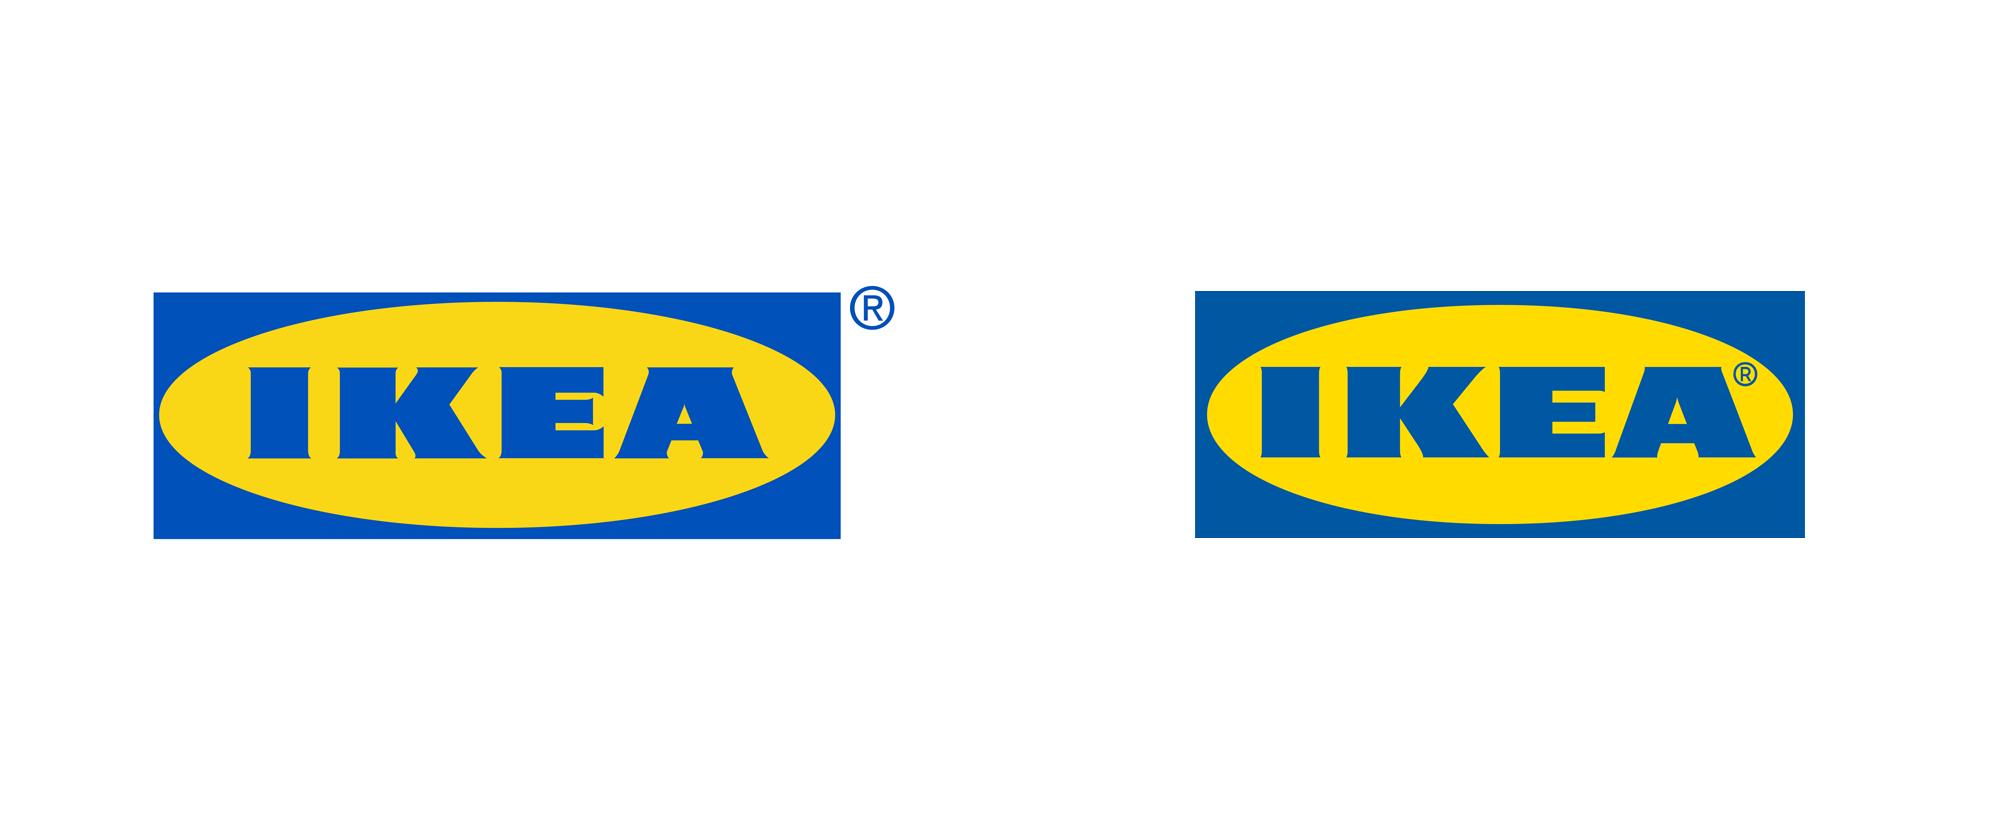 Ikea Logo Sign Brand Business, Business Transparent Background Png Pluspng.com  - Ikea Logo PNG